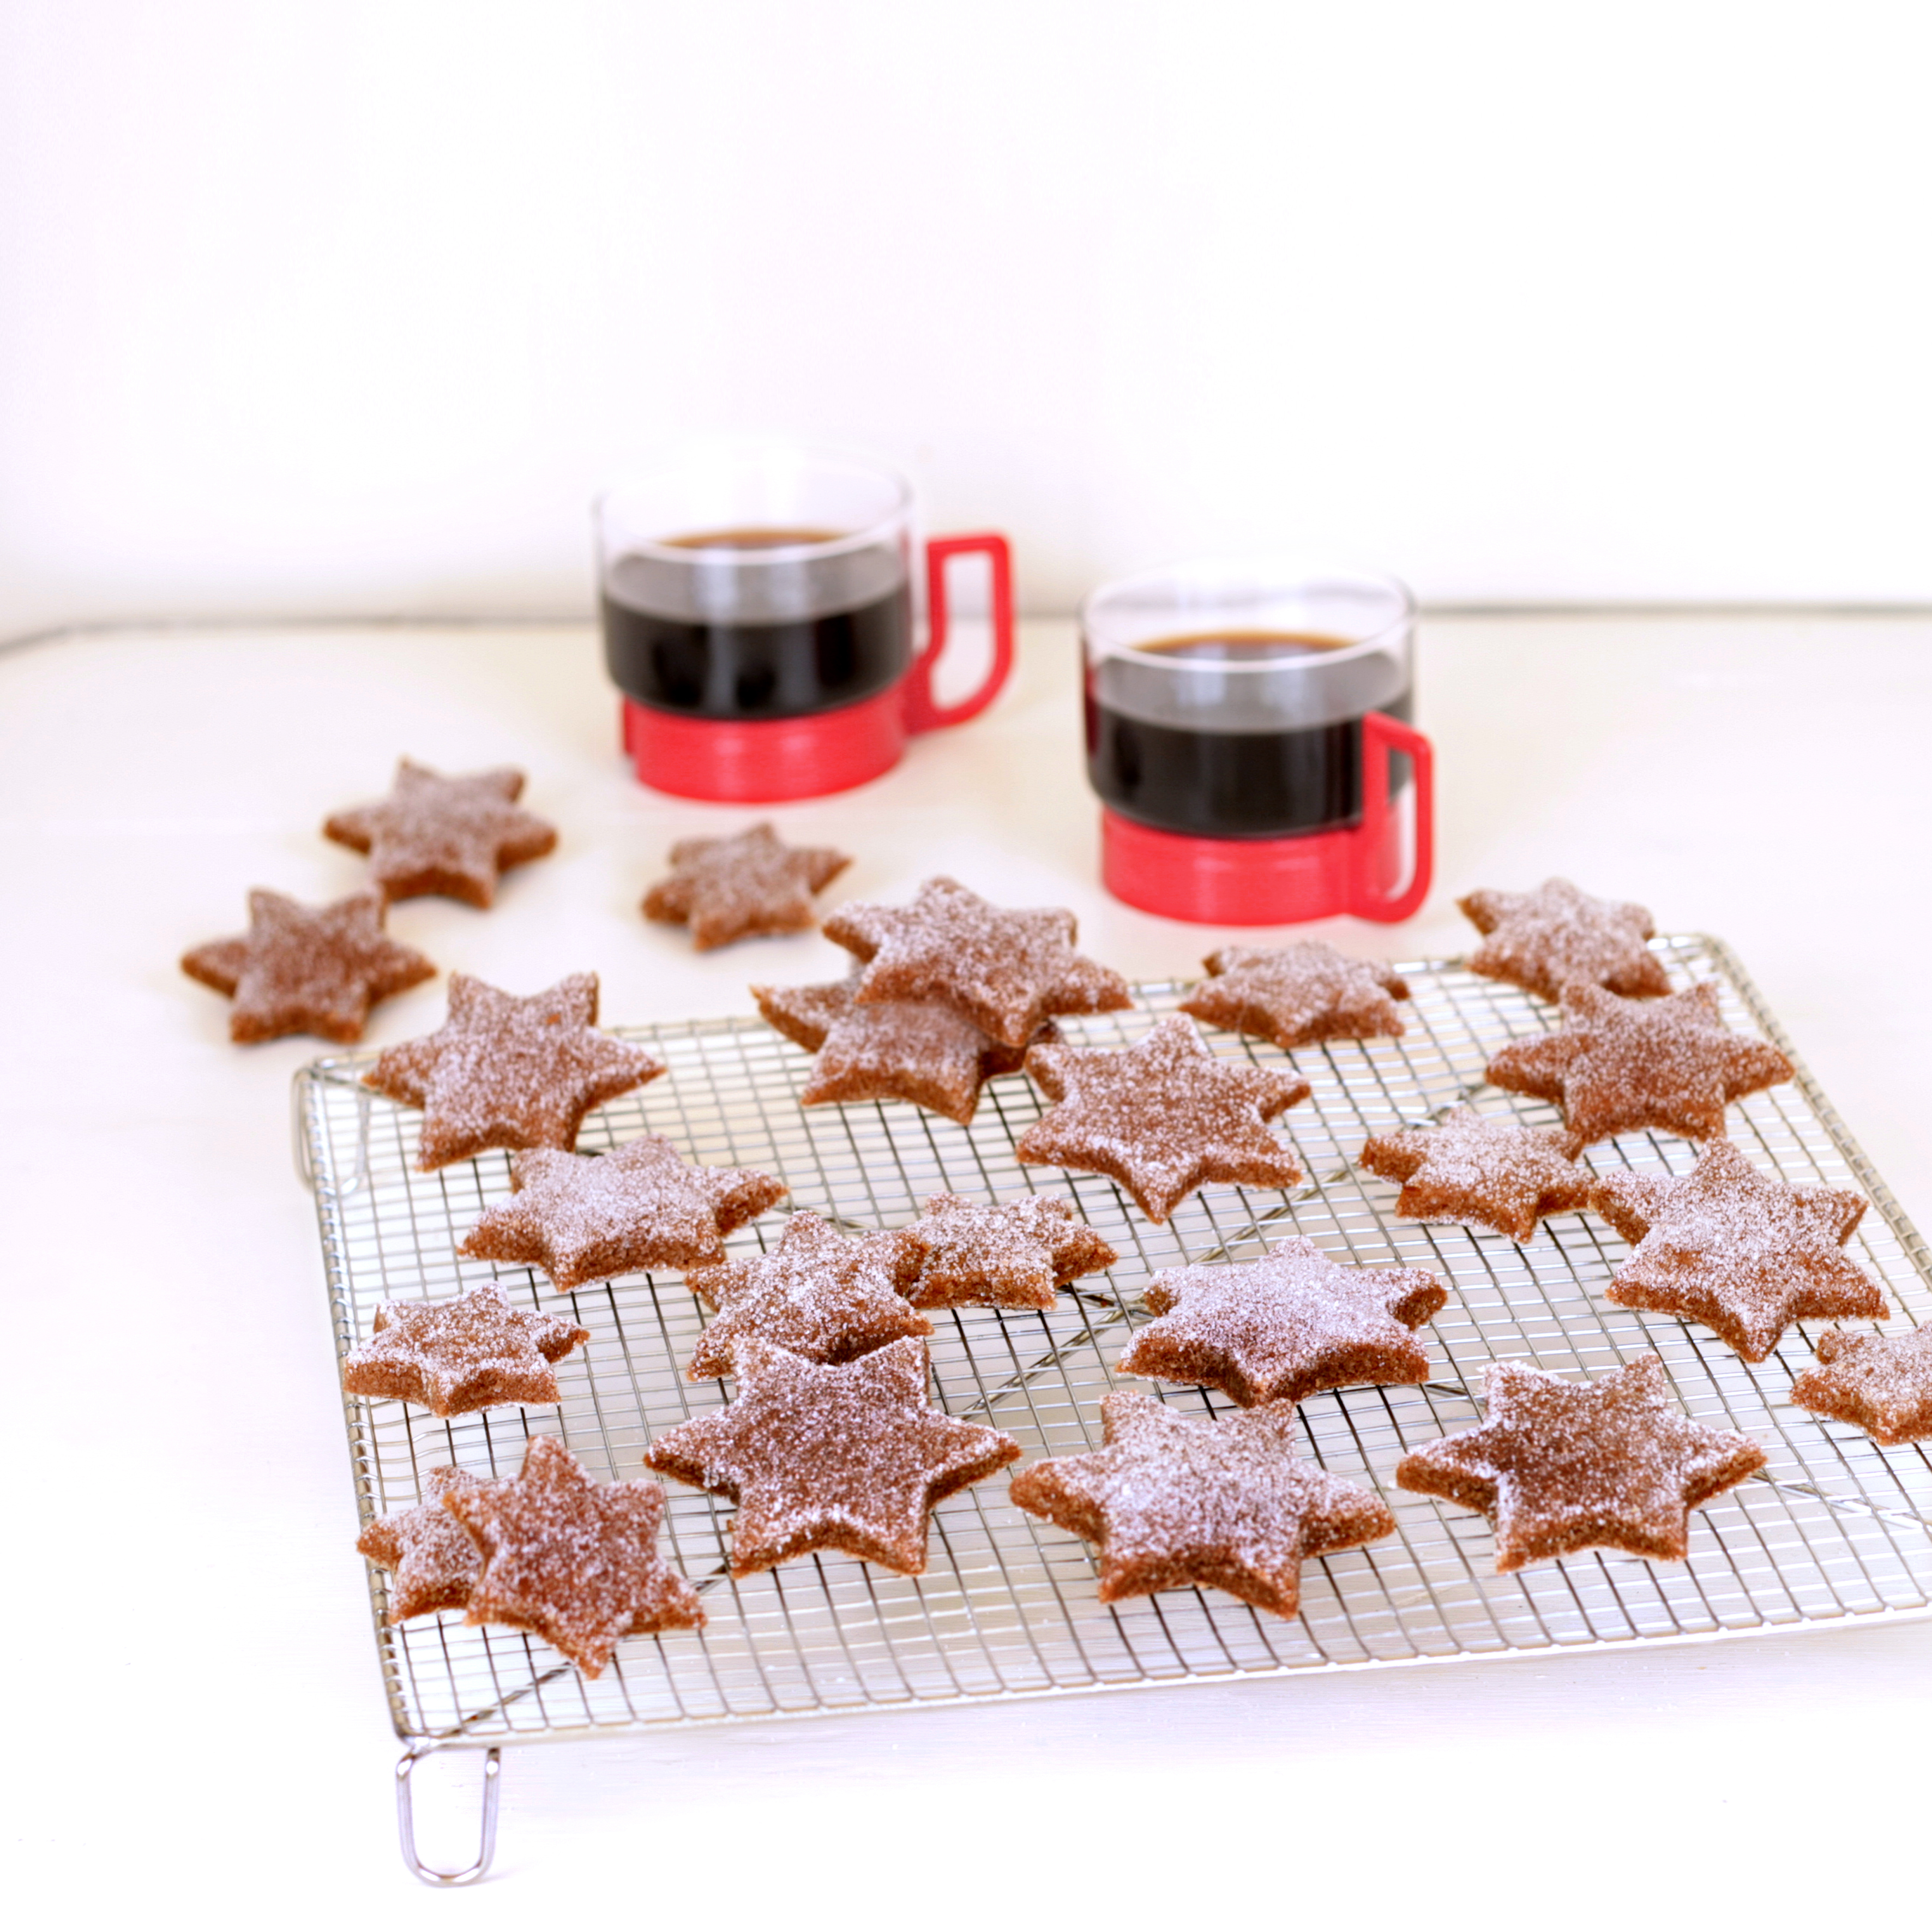 Biscuits de Noël - Bruns de Bâle - Brunsli